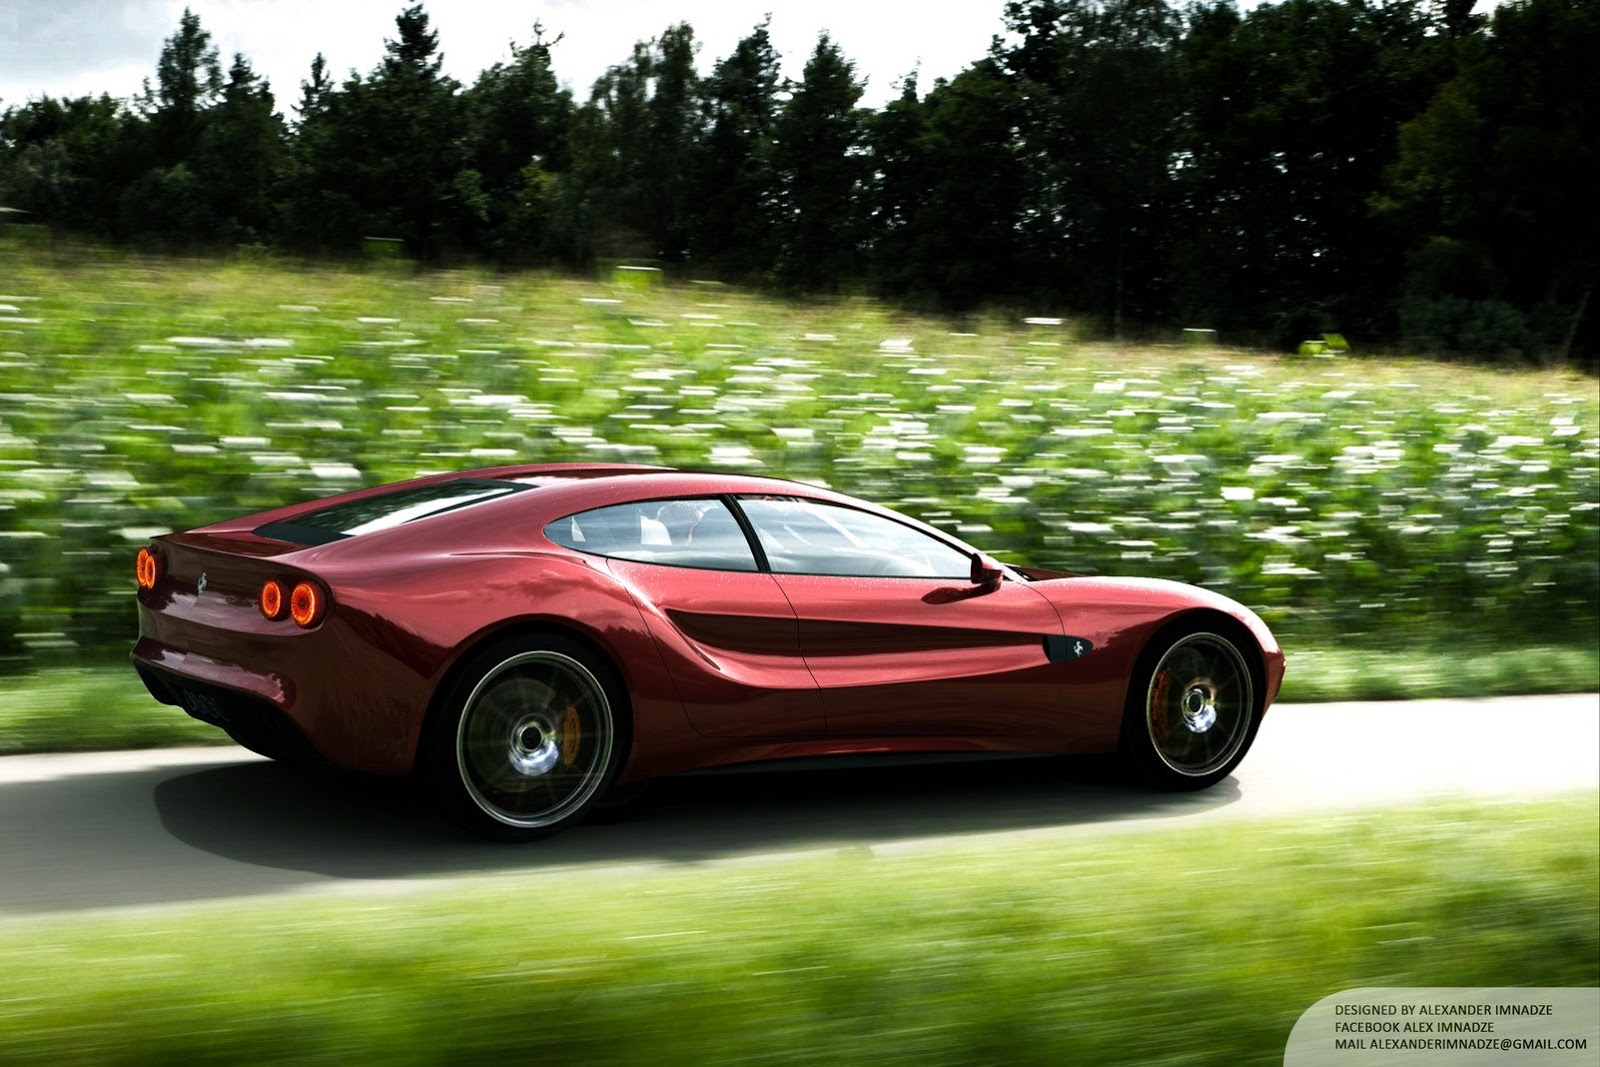 http://images.caradisiac.com/images/3/5/1/9/83519/S0-Une-proposition-de-Ferrari-Quattroporte-281555.jpg